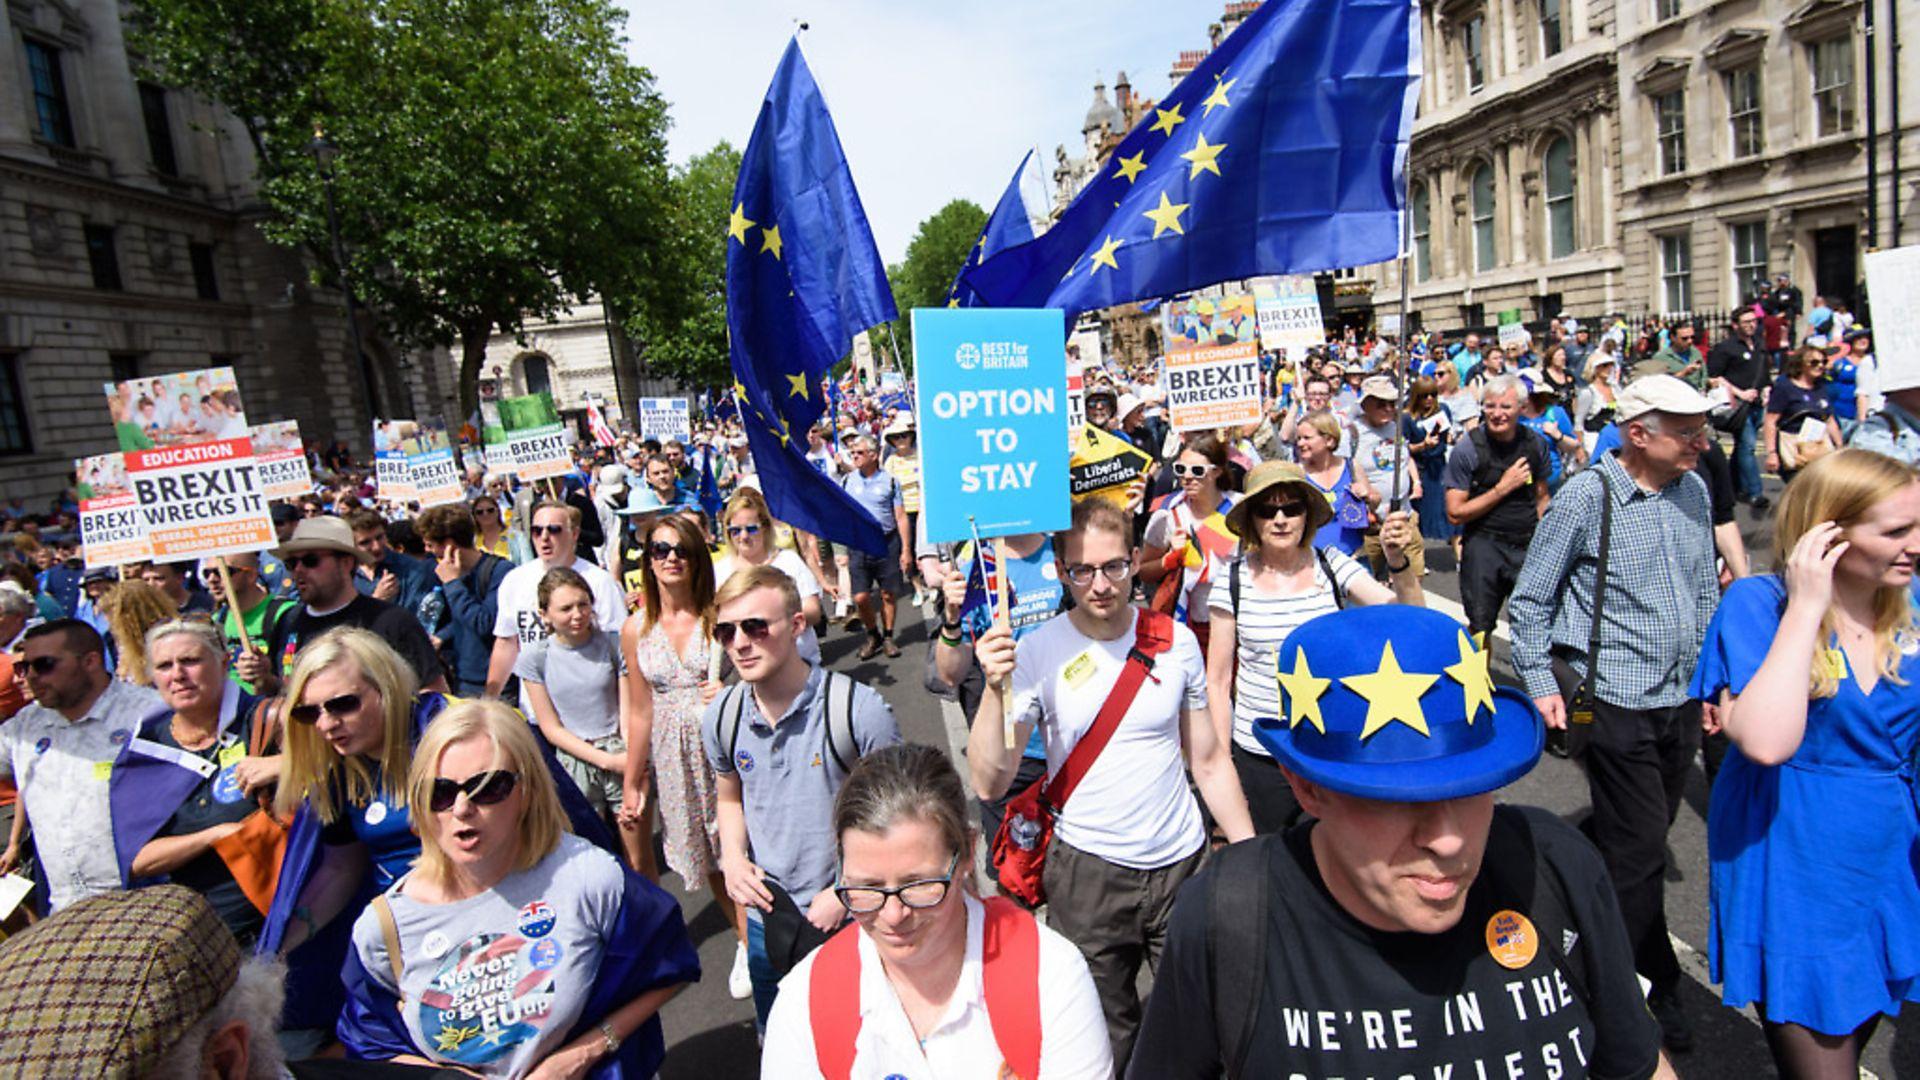 Anti-Brexit demonstrators fill Parliament Square in central London in June 2018. Photograph: Matt Crossick/EMPICS Entertainment. - Credit: Empics Entertainment